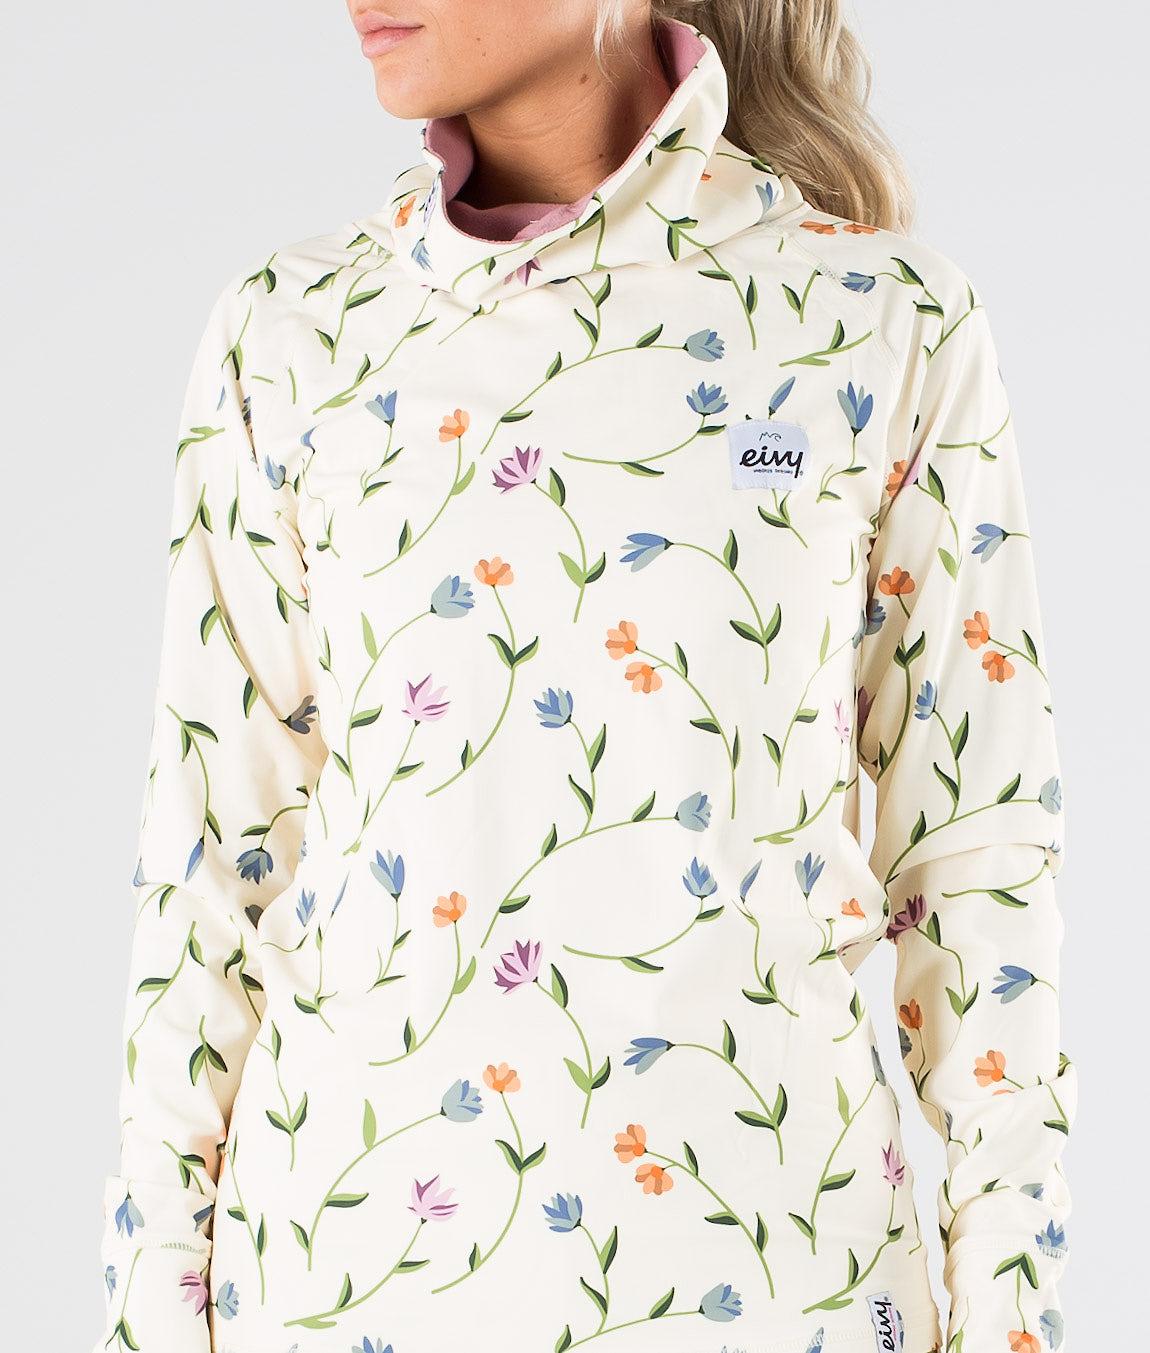 Eivy Icecold Top Superundertøy overdel Dangling Florals